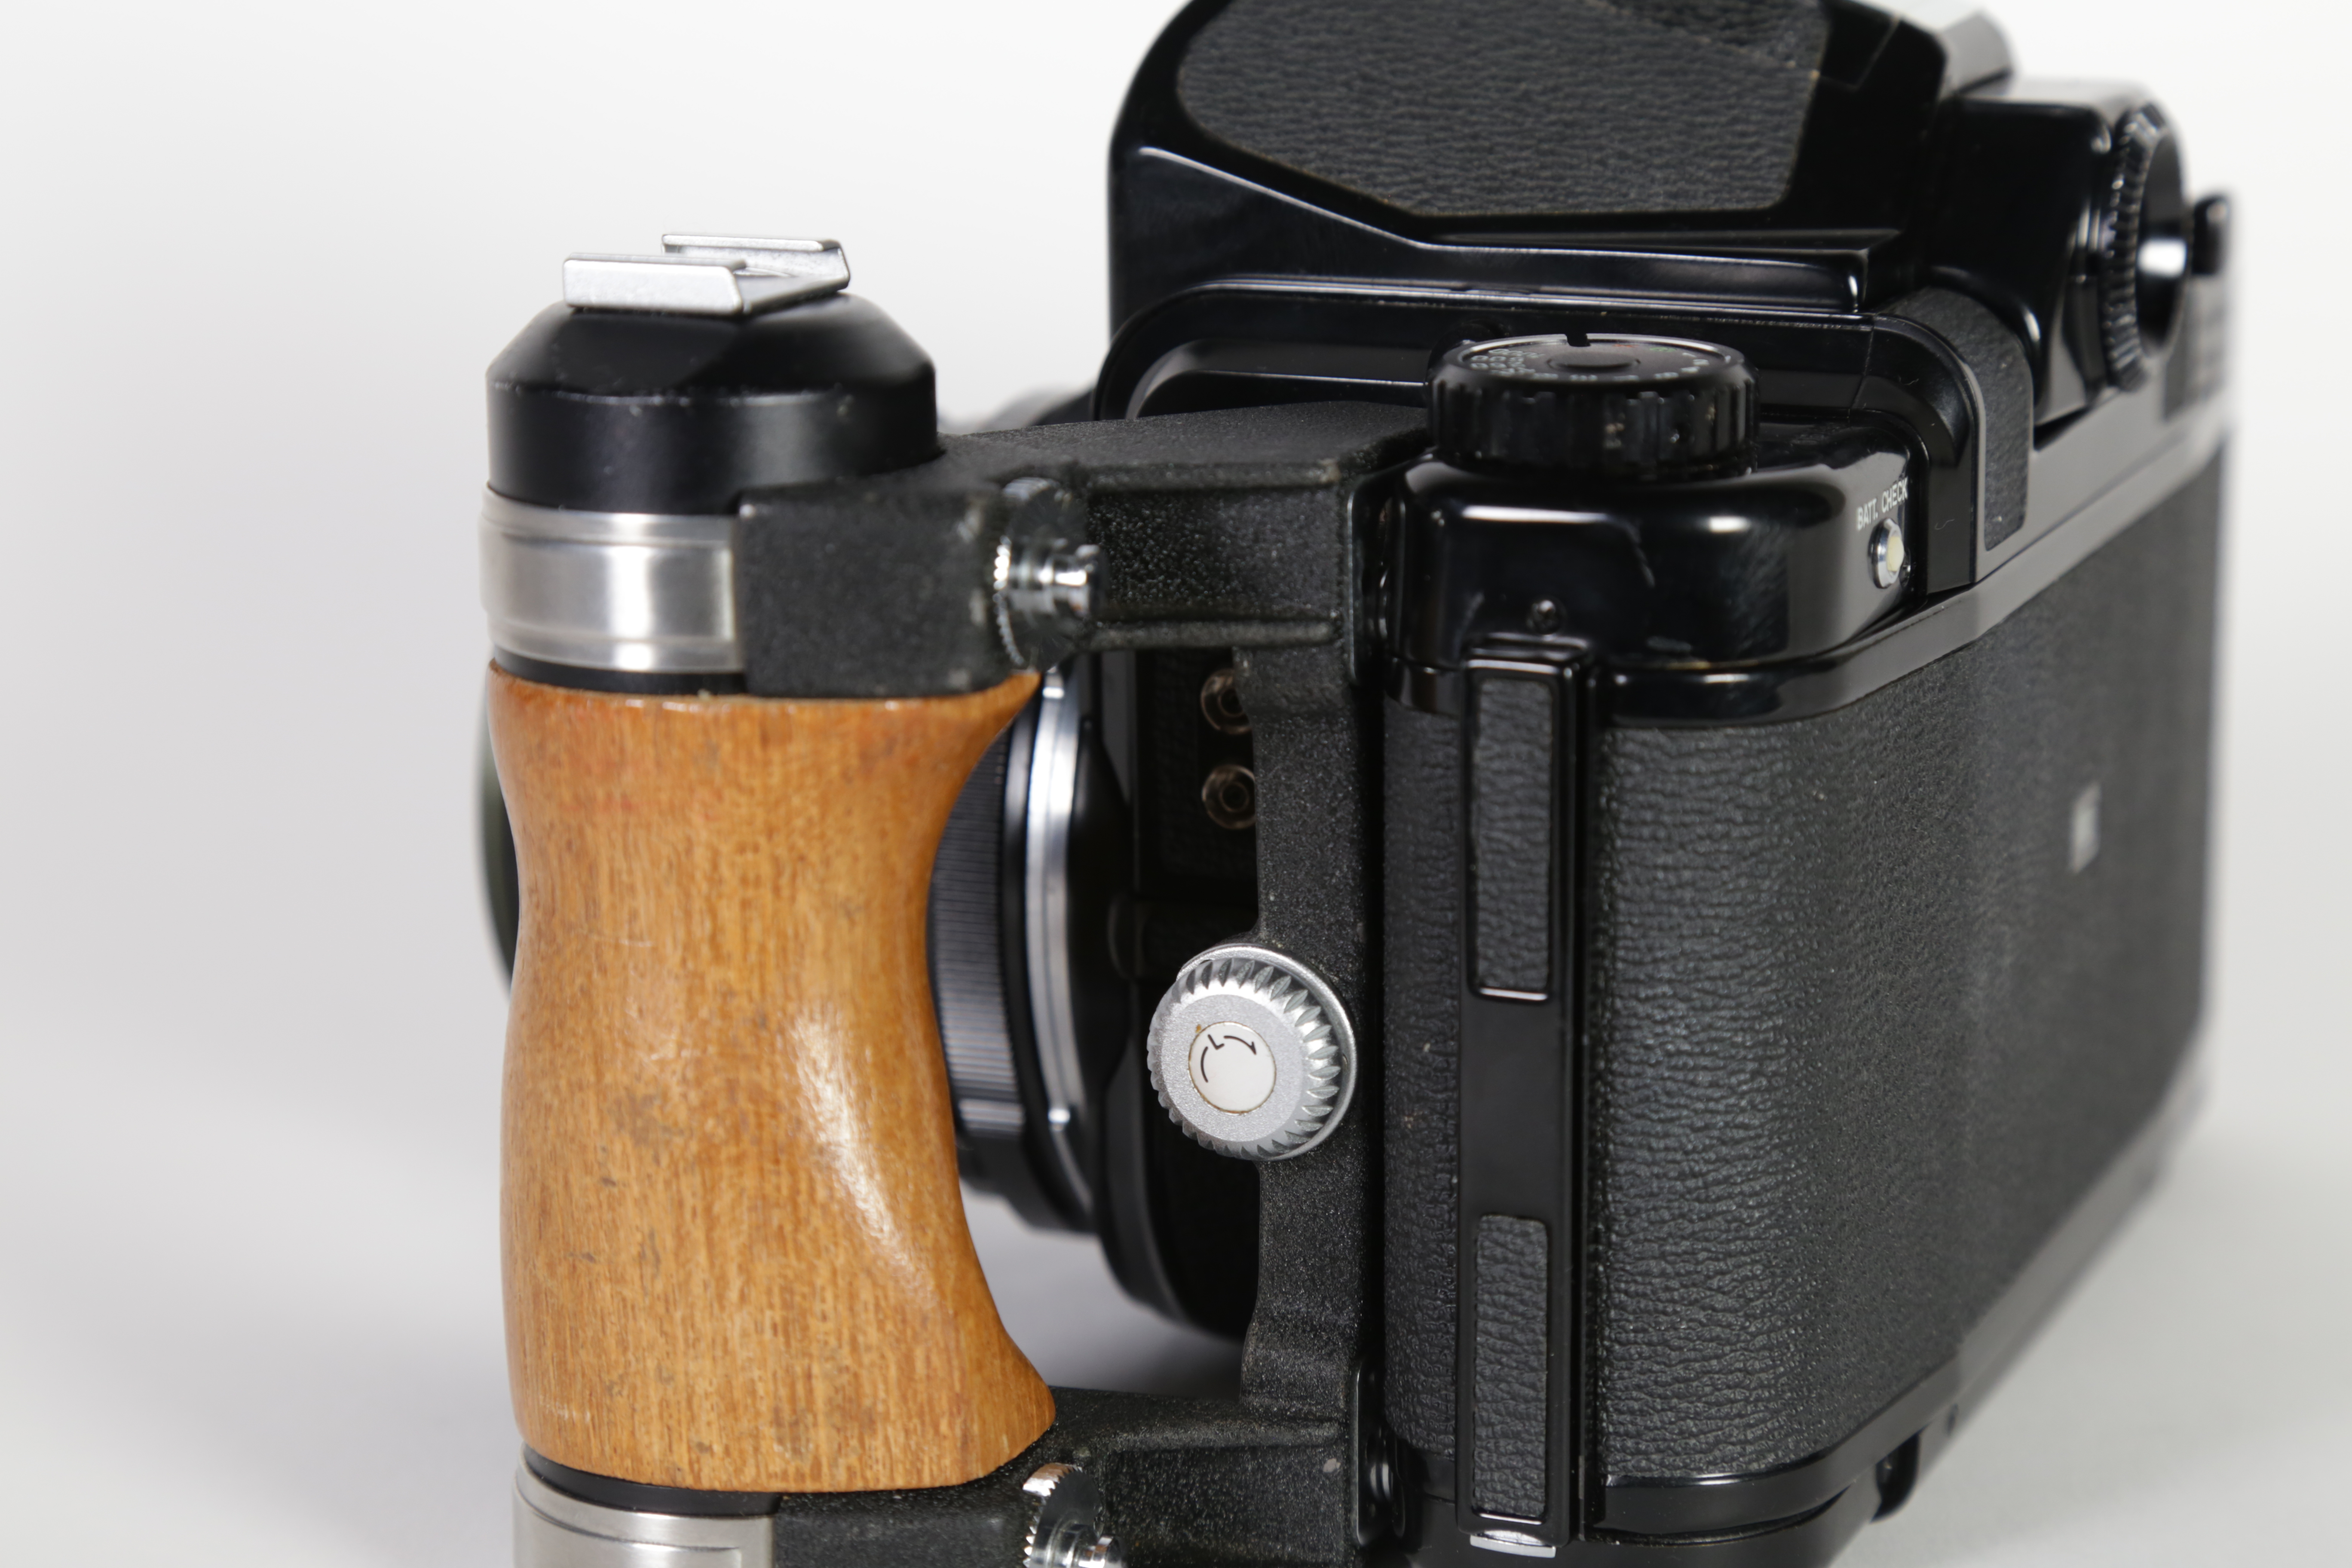 Medium Format Cameras Operating Guide - Help Wiki